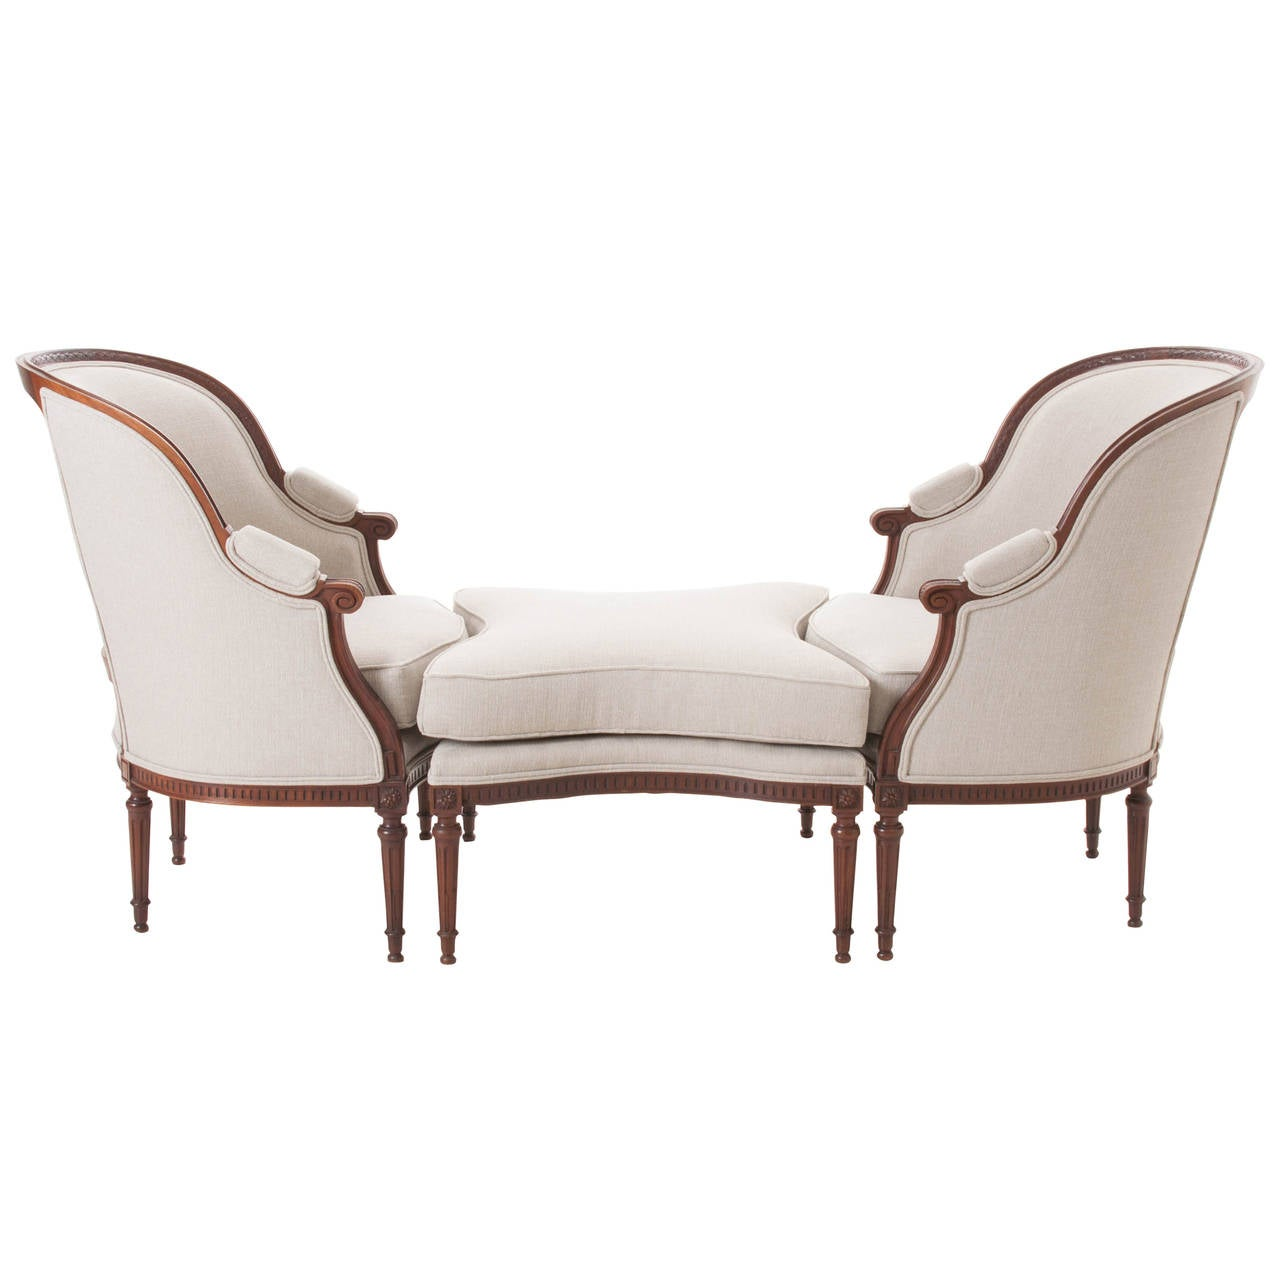 French 19th century louis xvi duchesse brisee at 1stdibs - Louis th chairs ...